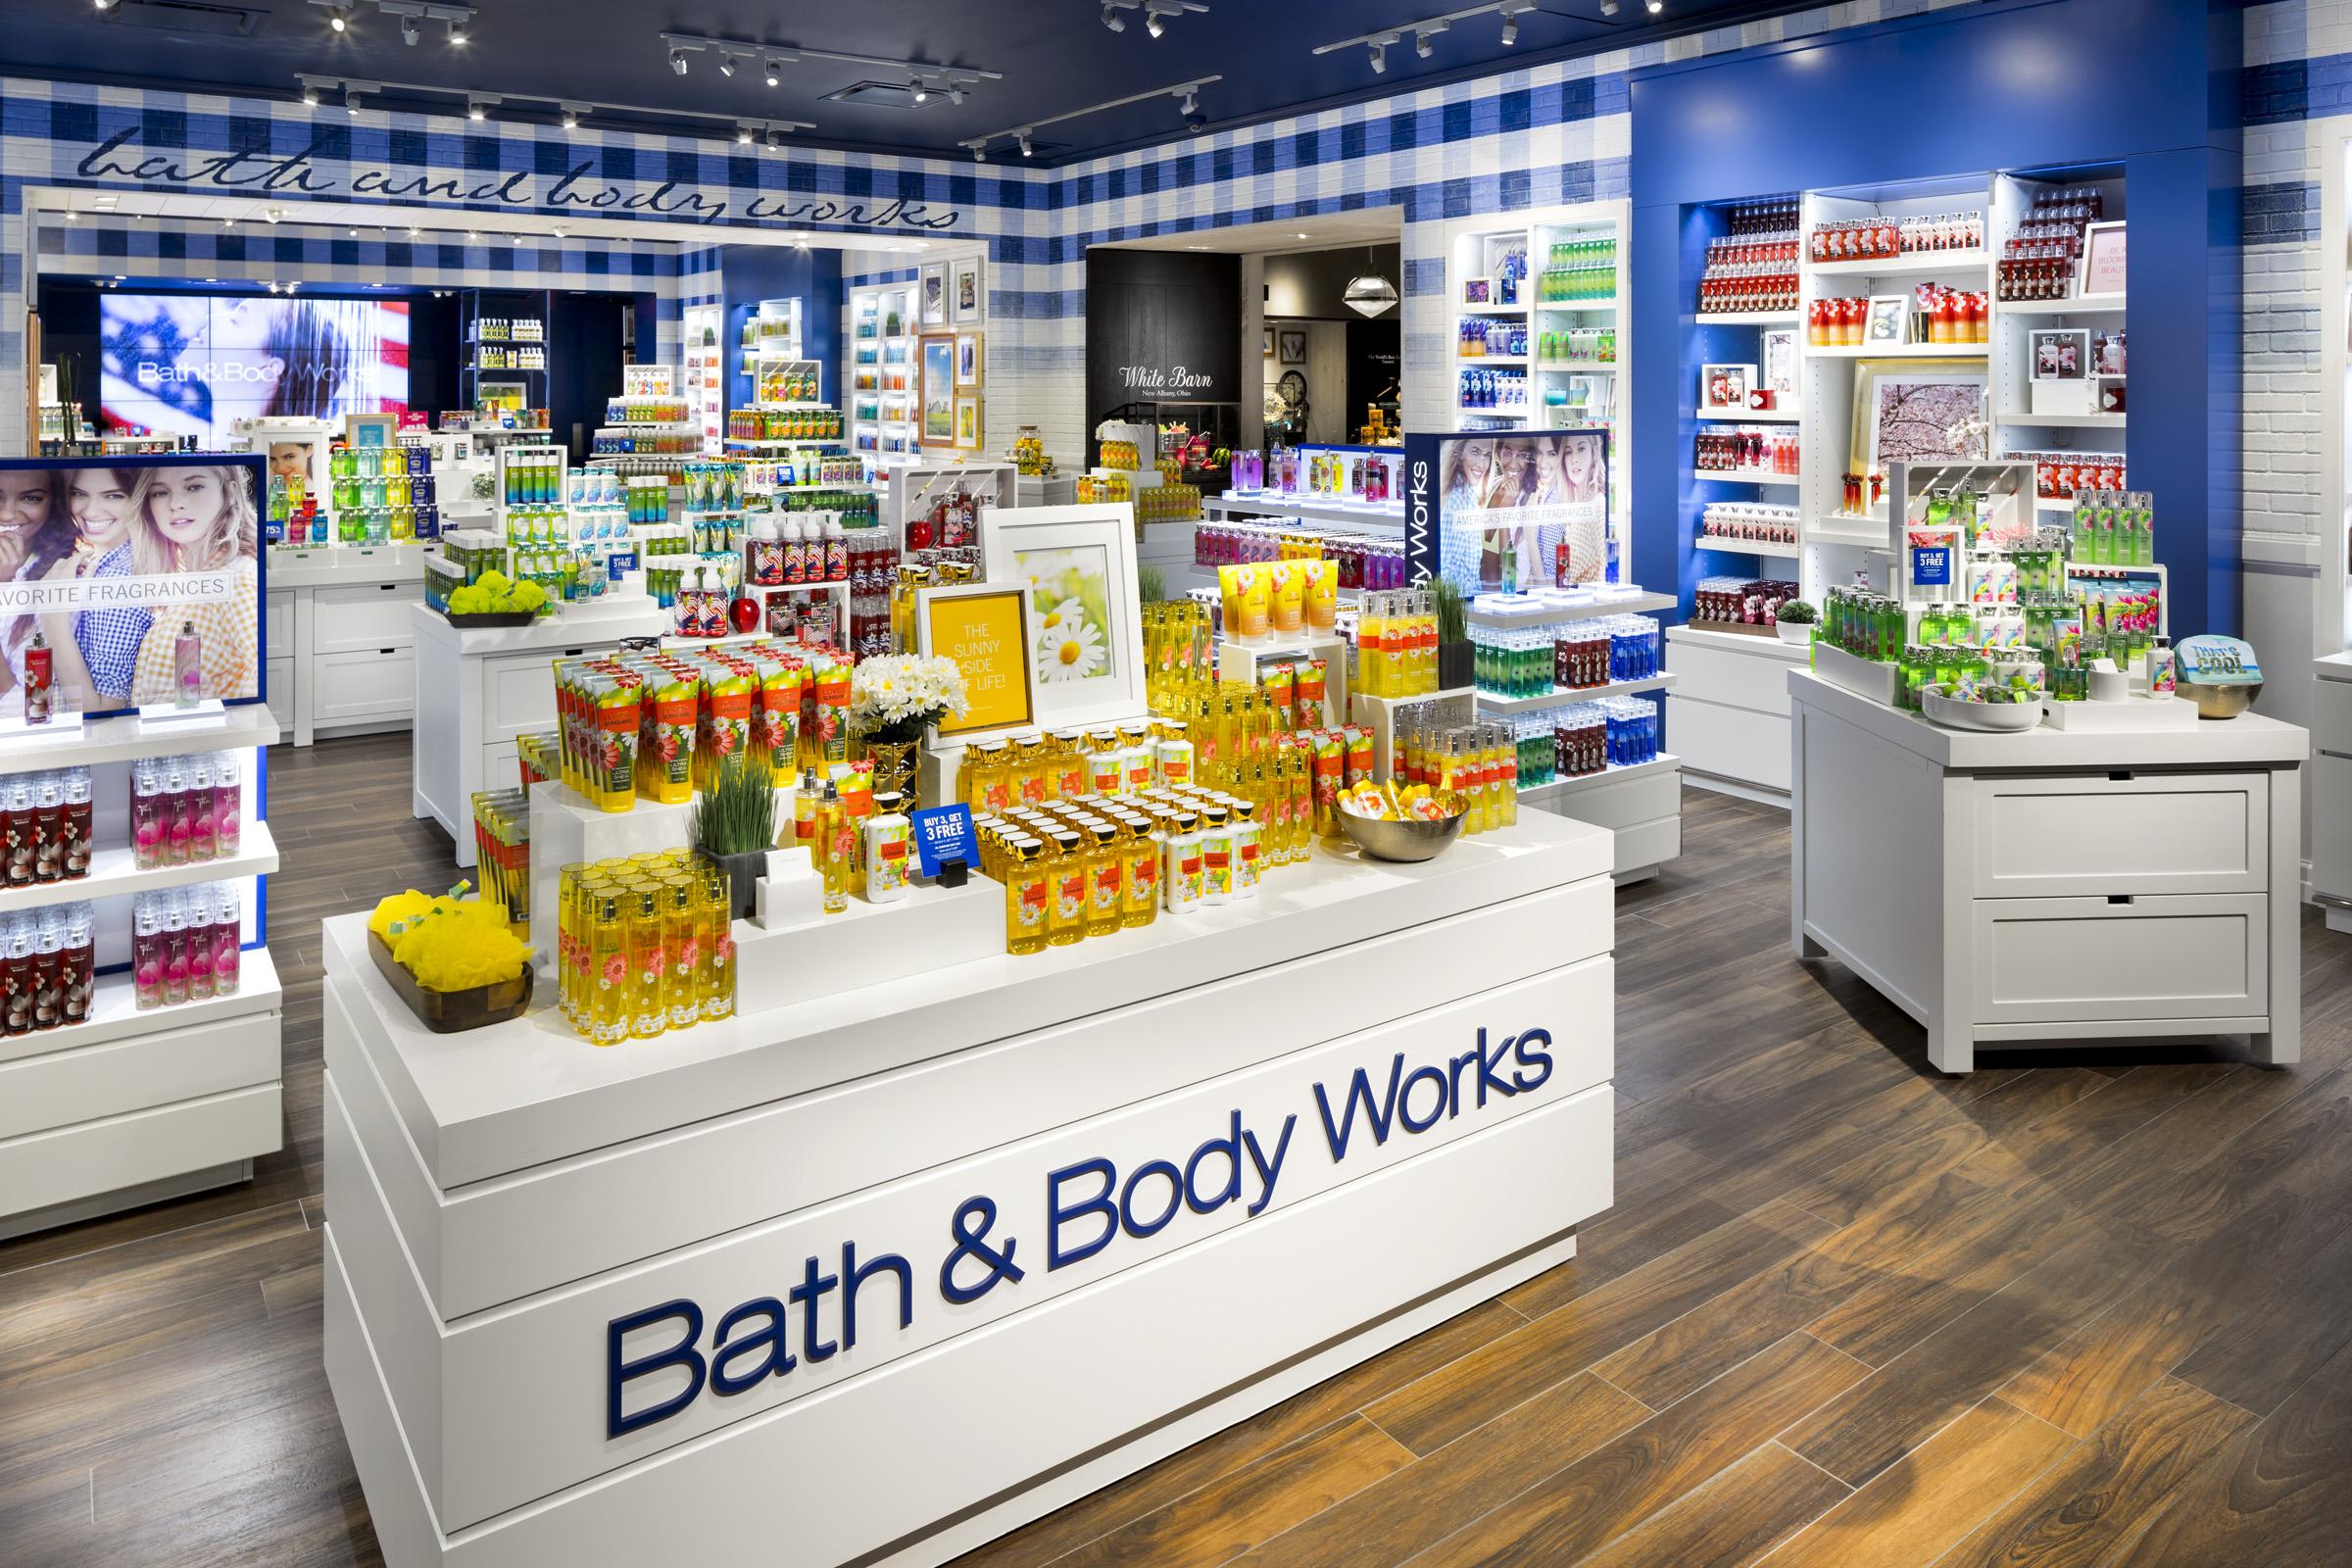 Bath & Body Works store interior